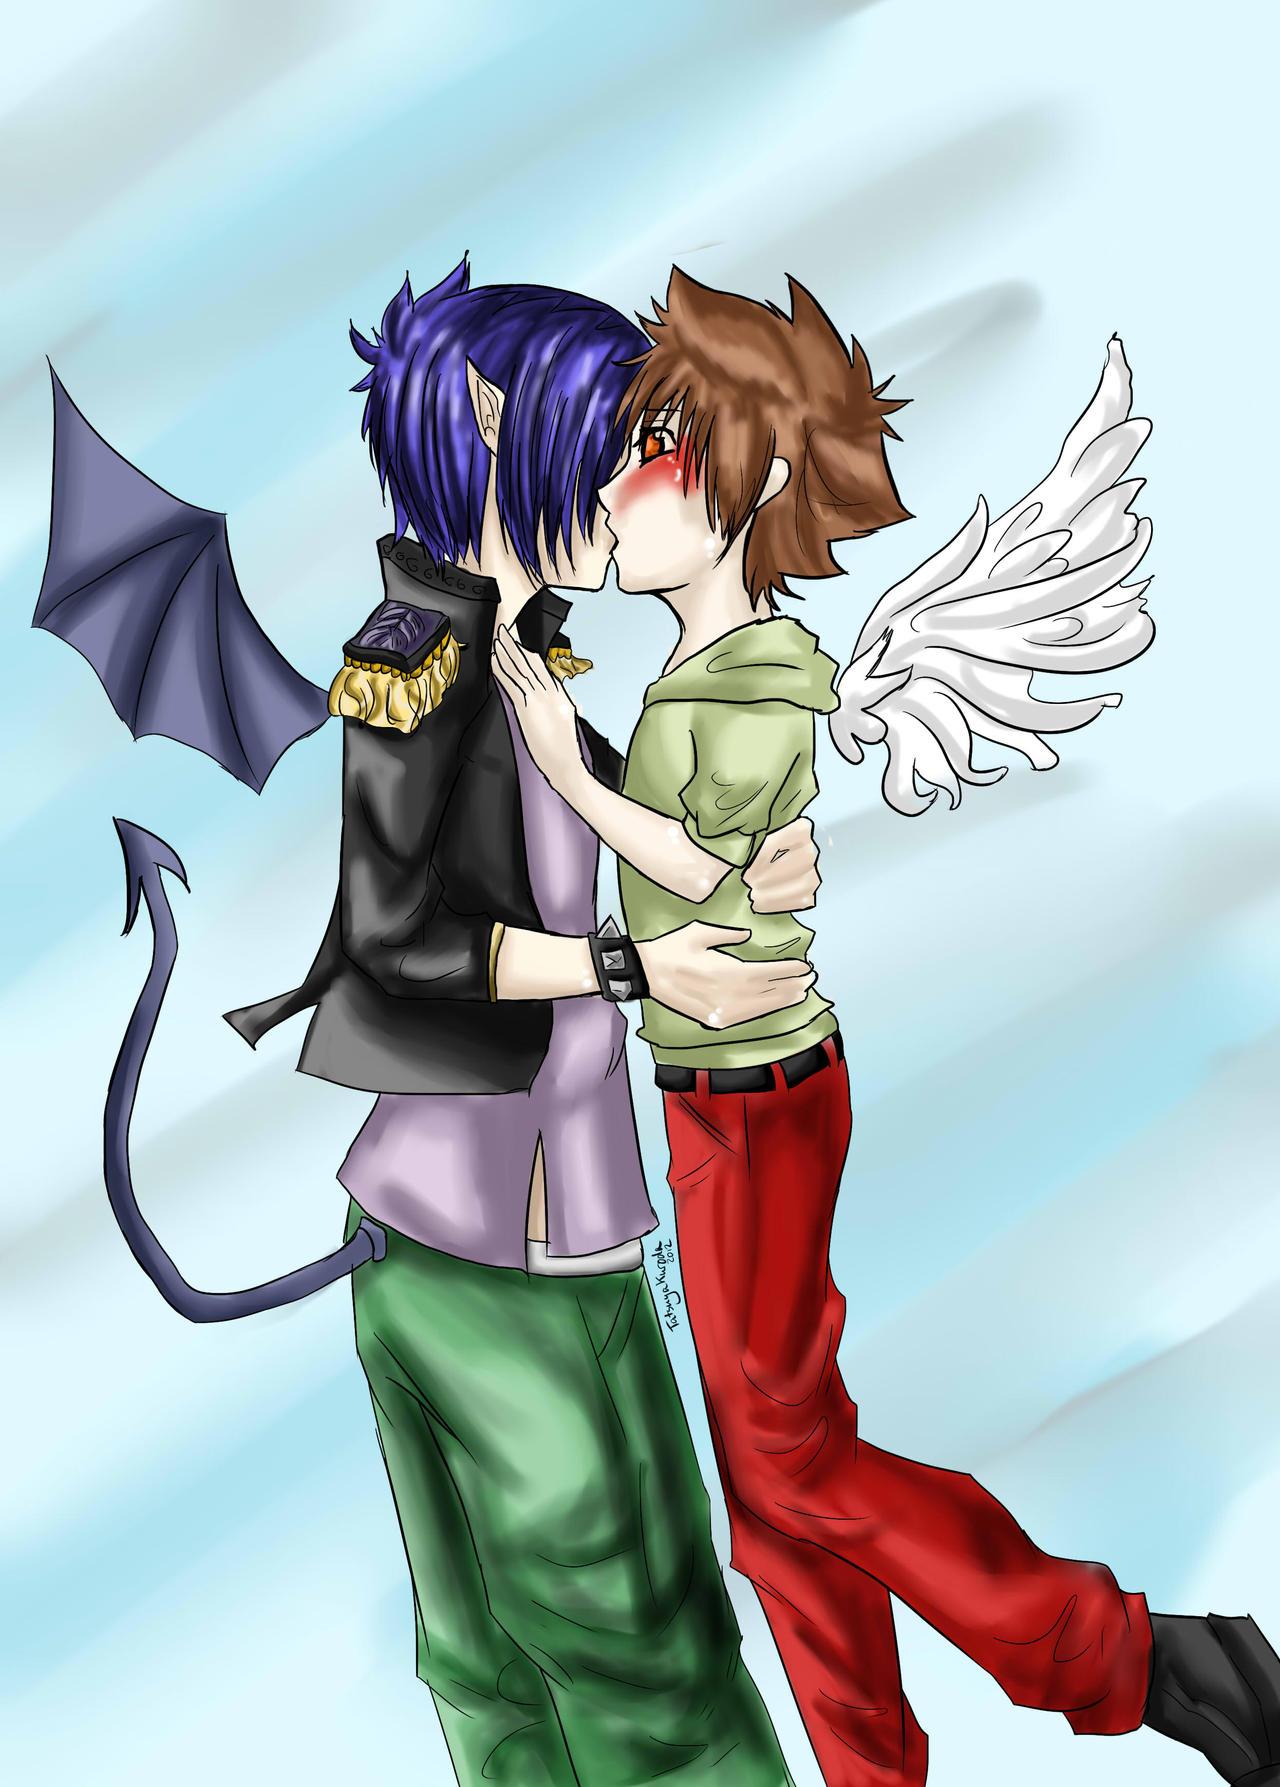 An Angel's Kiss By TatsuyaKuroda On DeviantArt